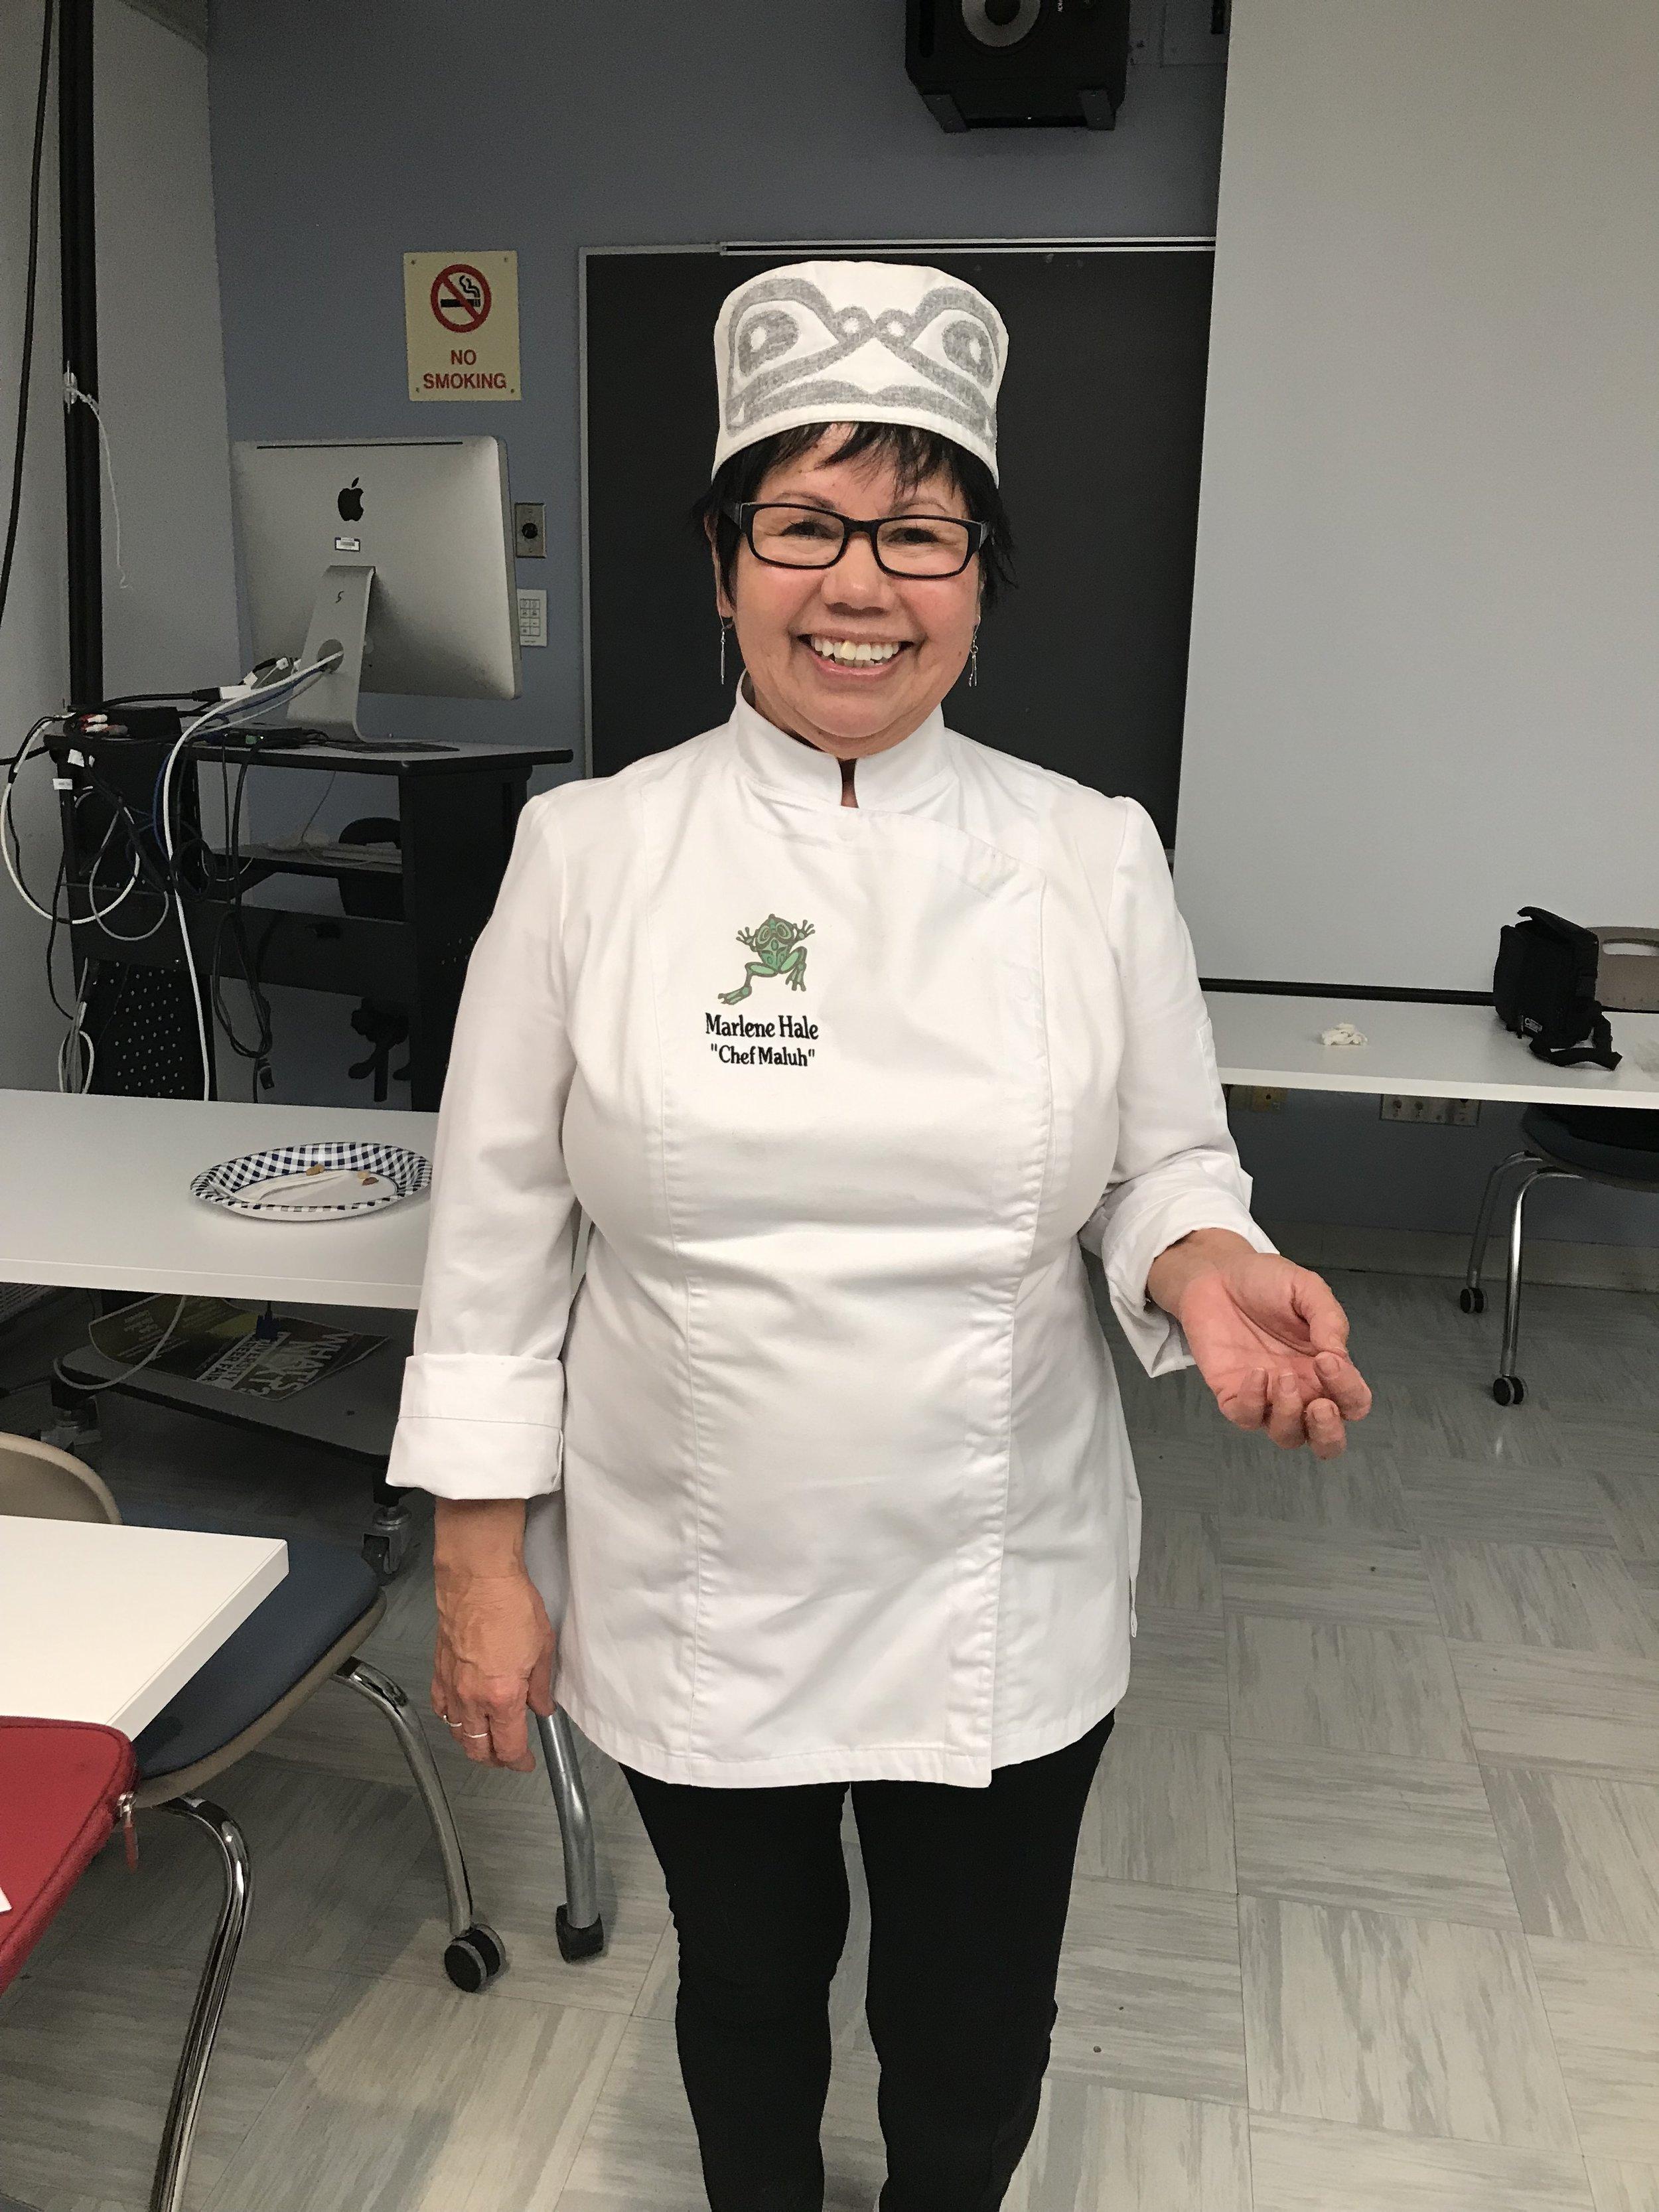 Marlene - Chef Maluh